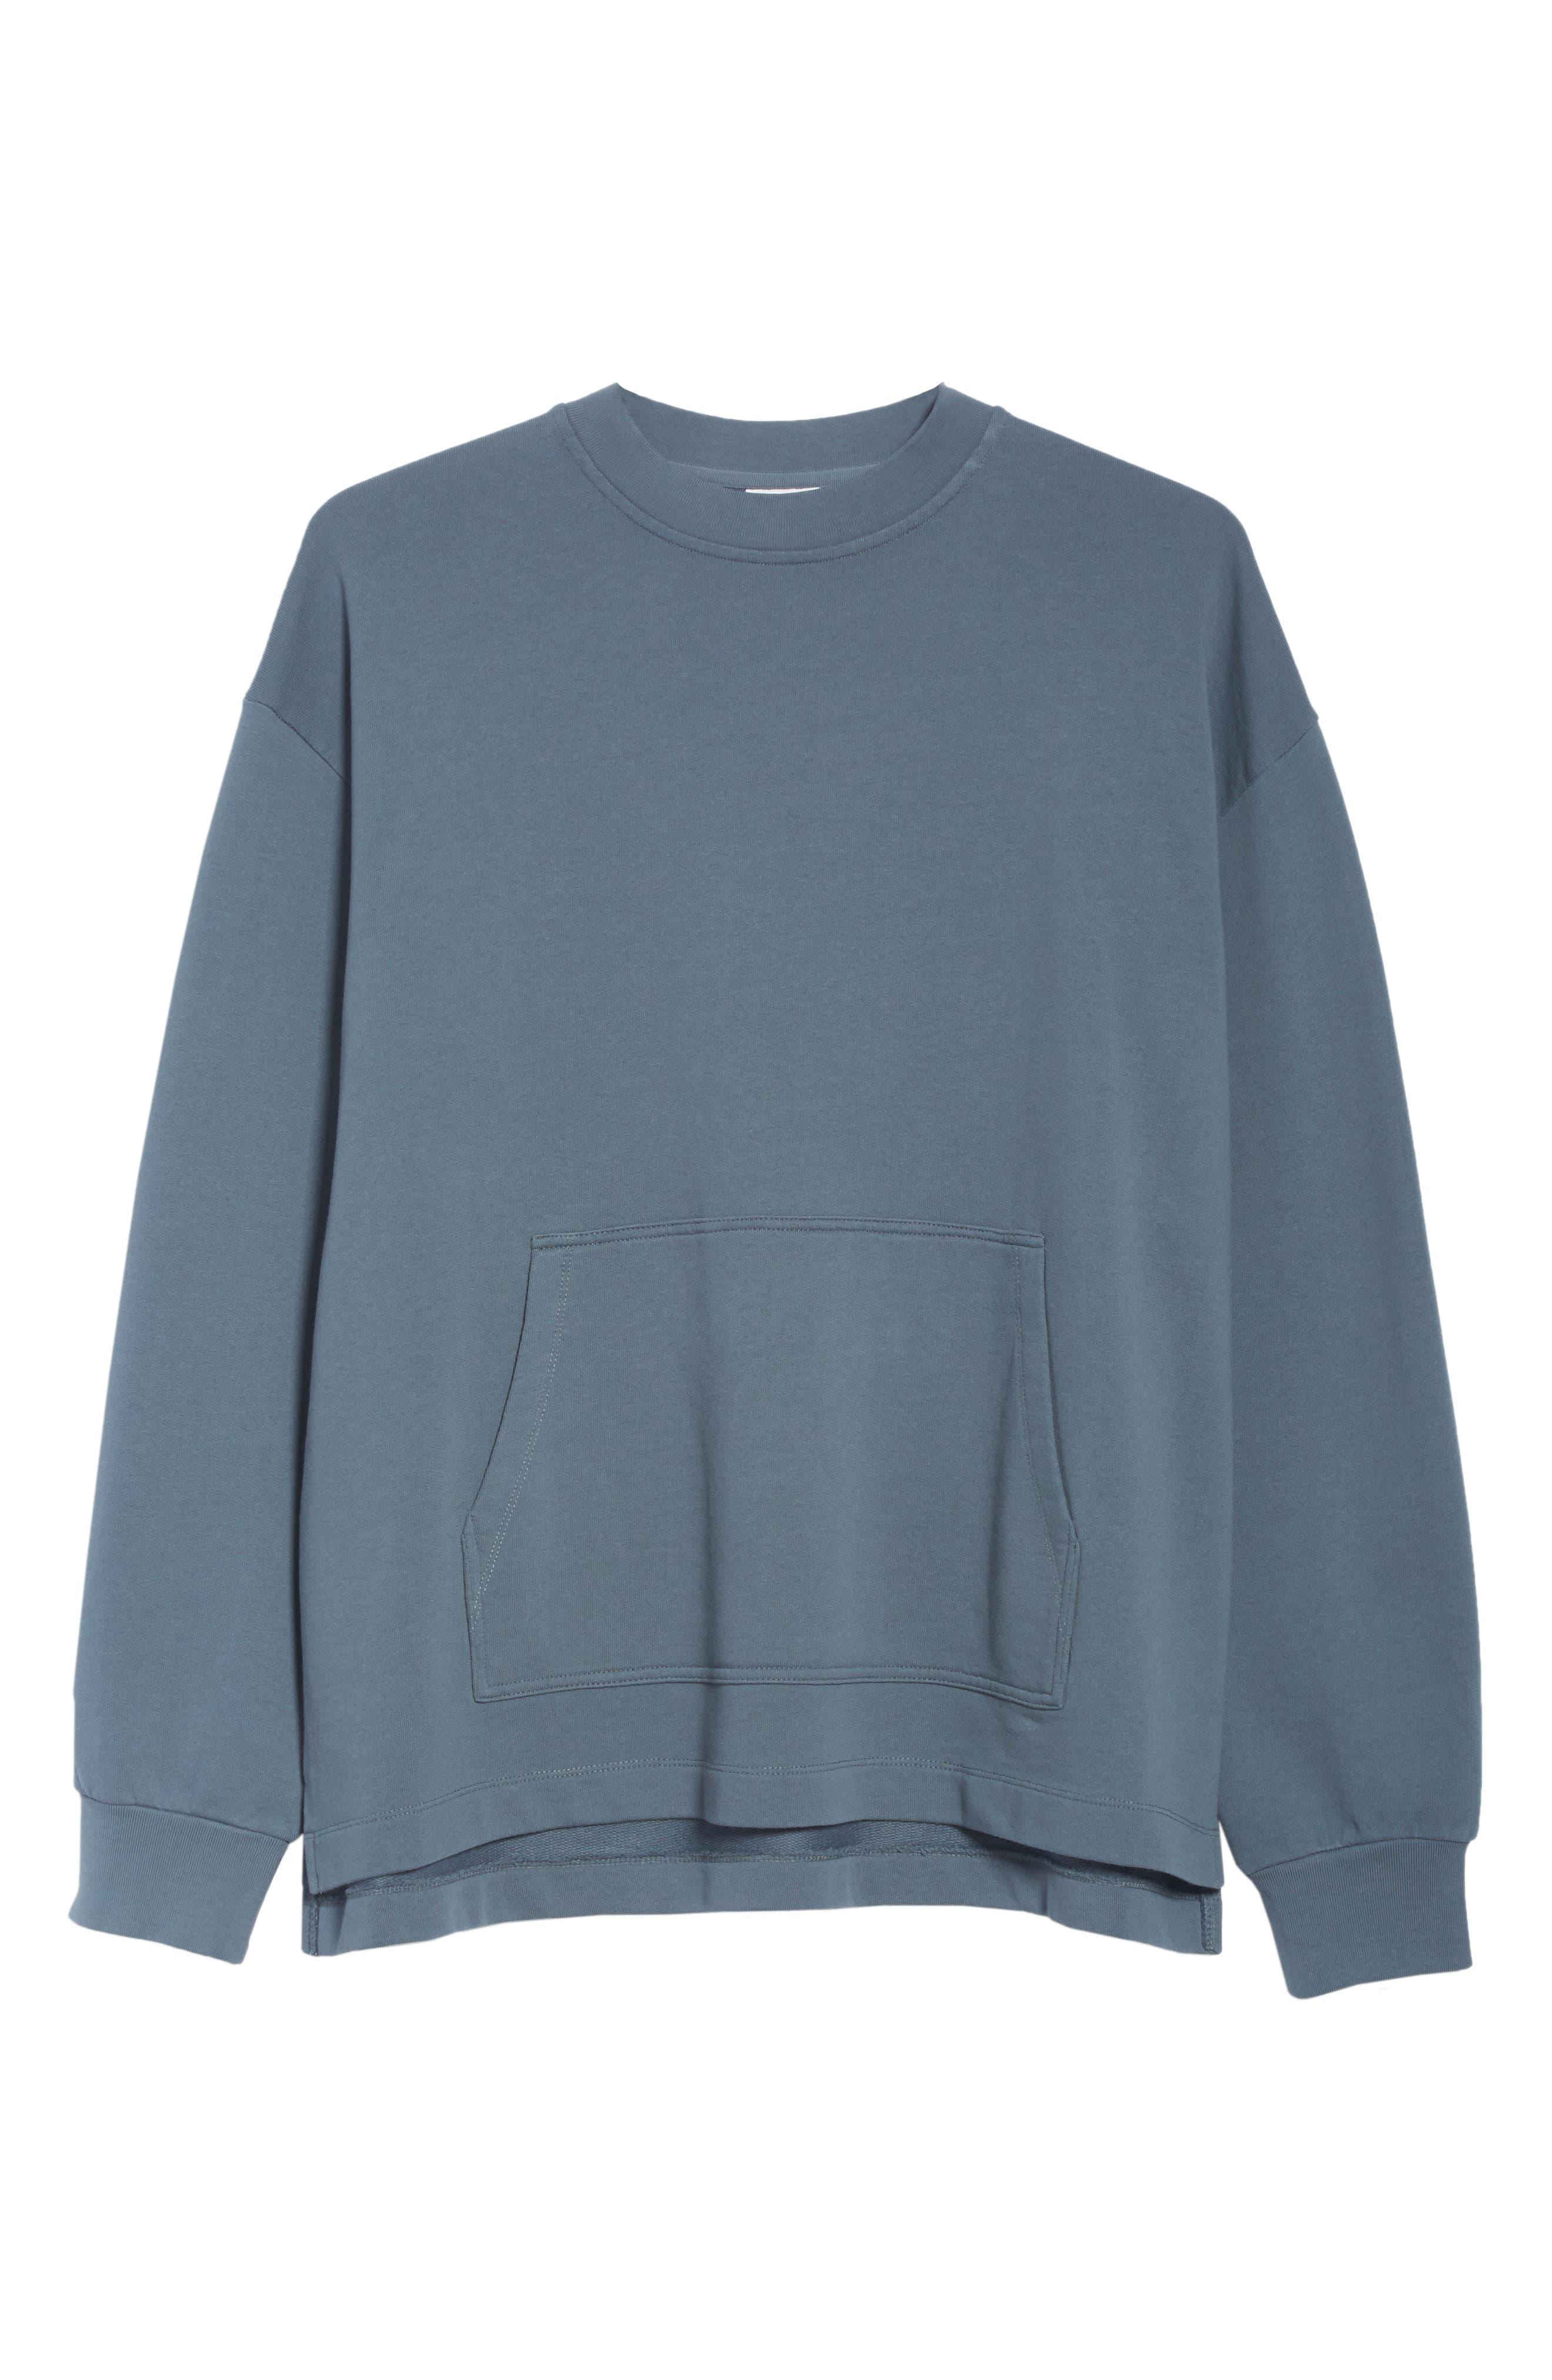 Fleece Knit Sweatshirt,                             Alternate thumbnail 6, color,                             GREY